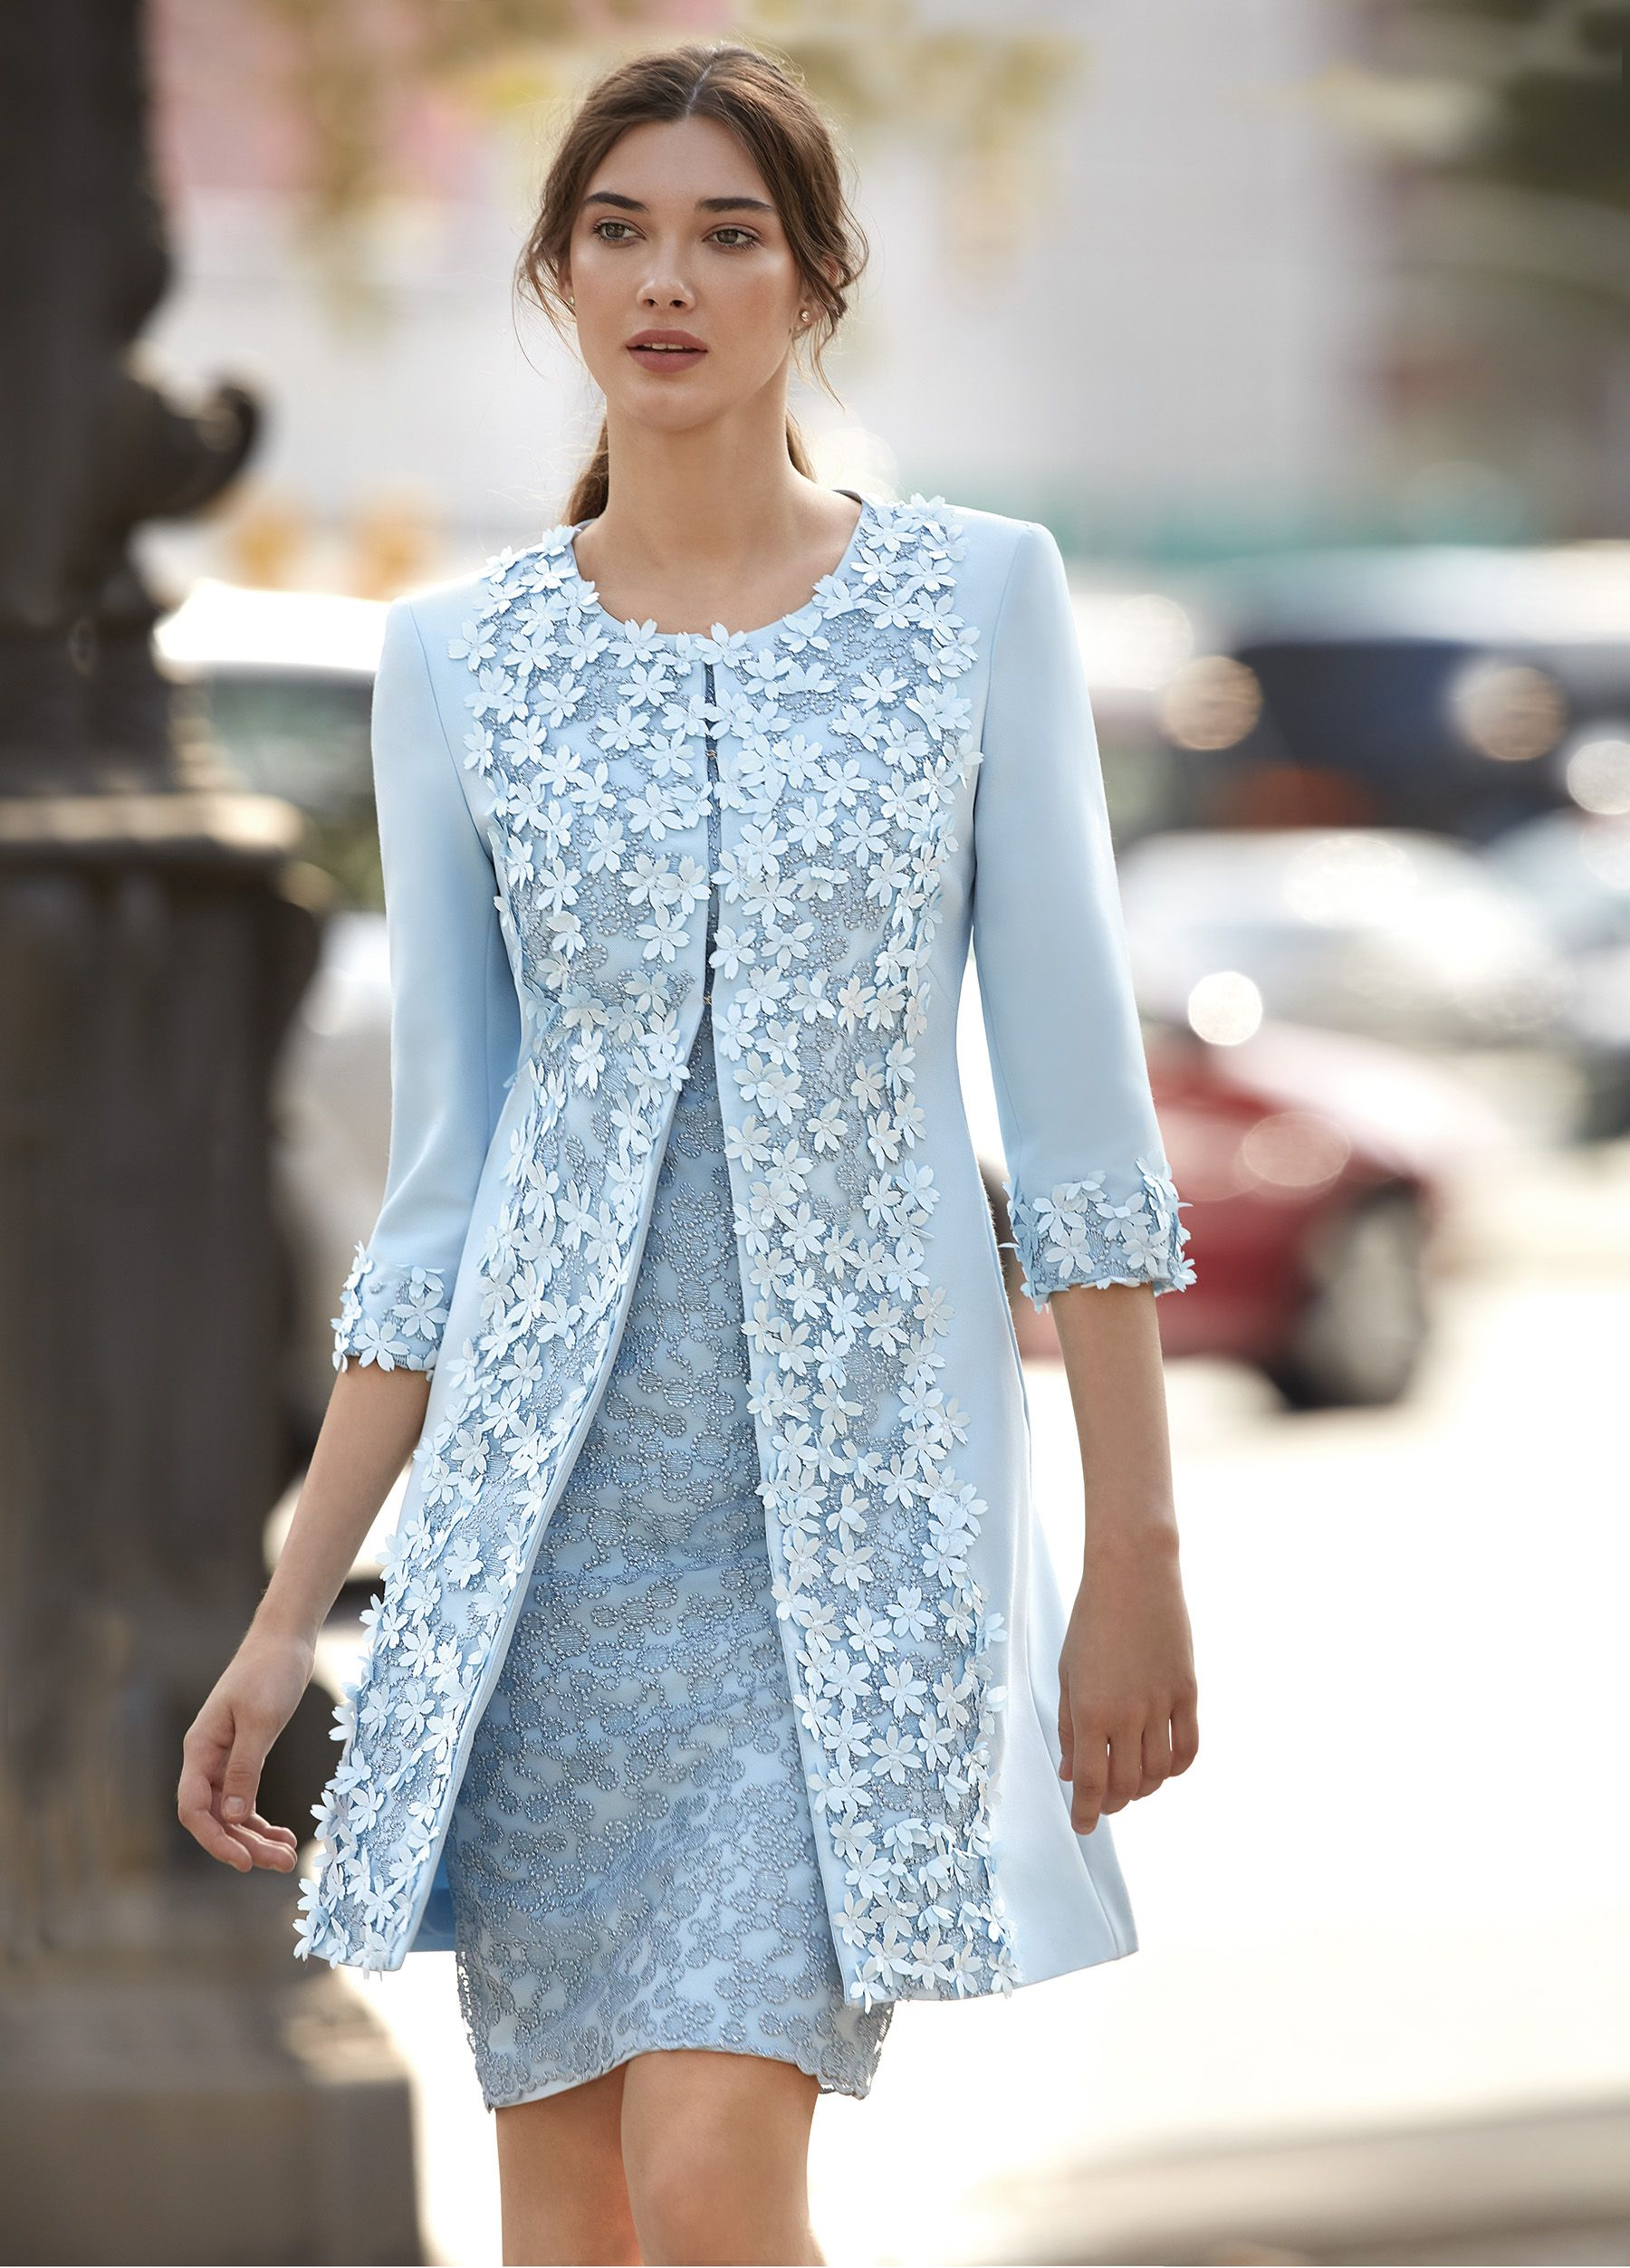 94537 - Carla Ruiz | Attrayant | Pinterest | Bride dresses, Mothers ...